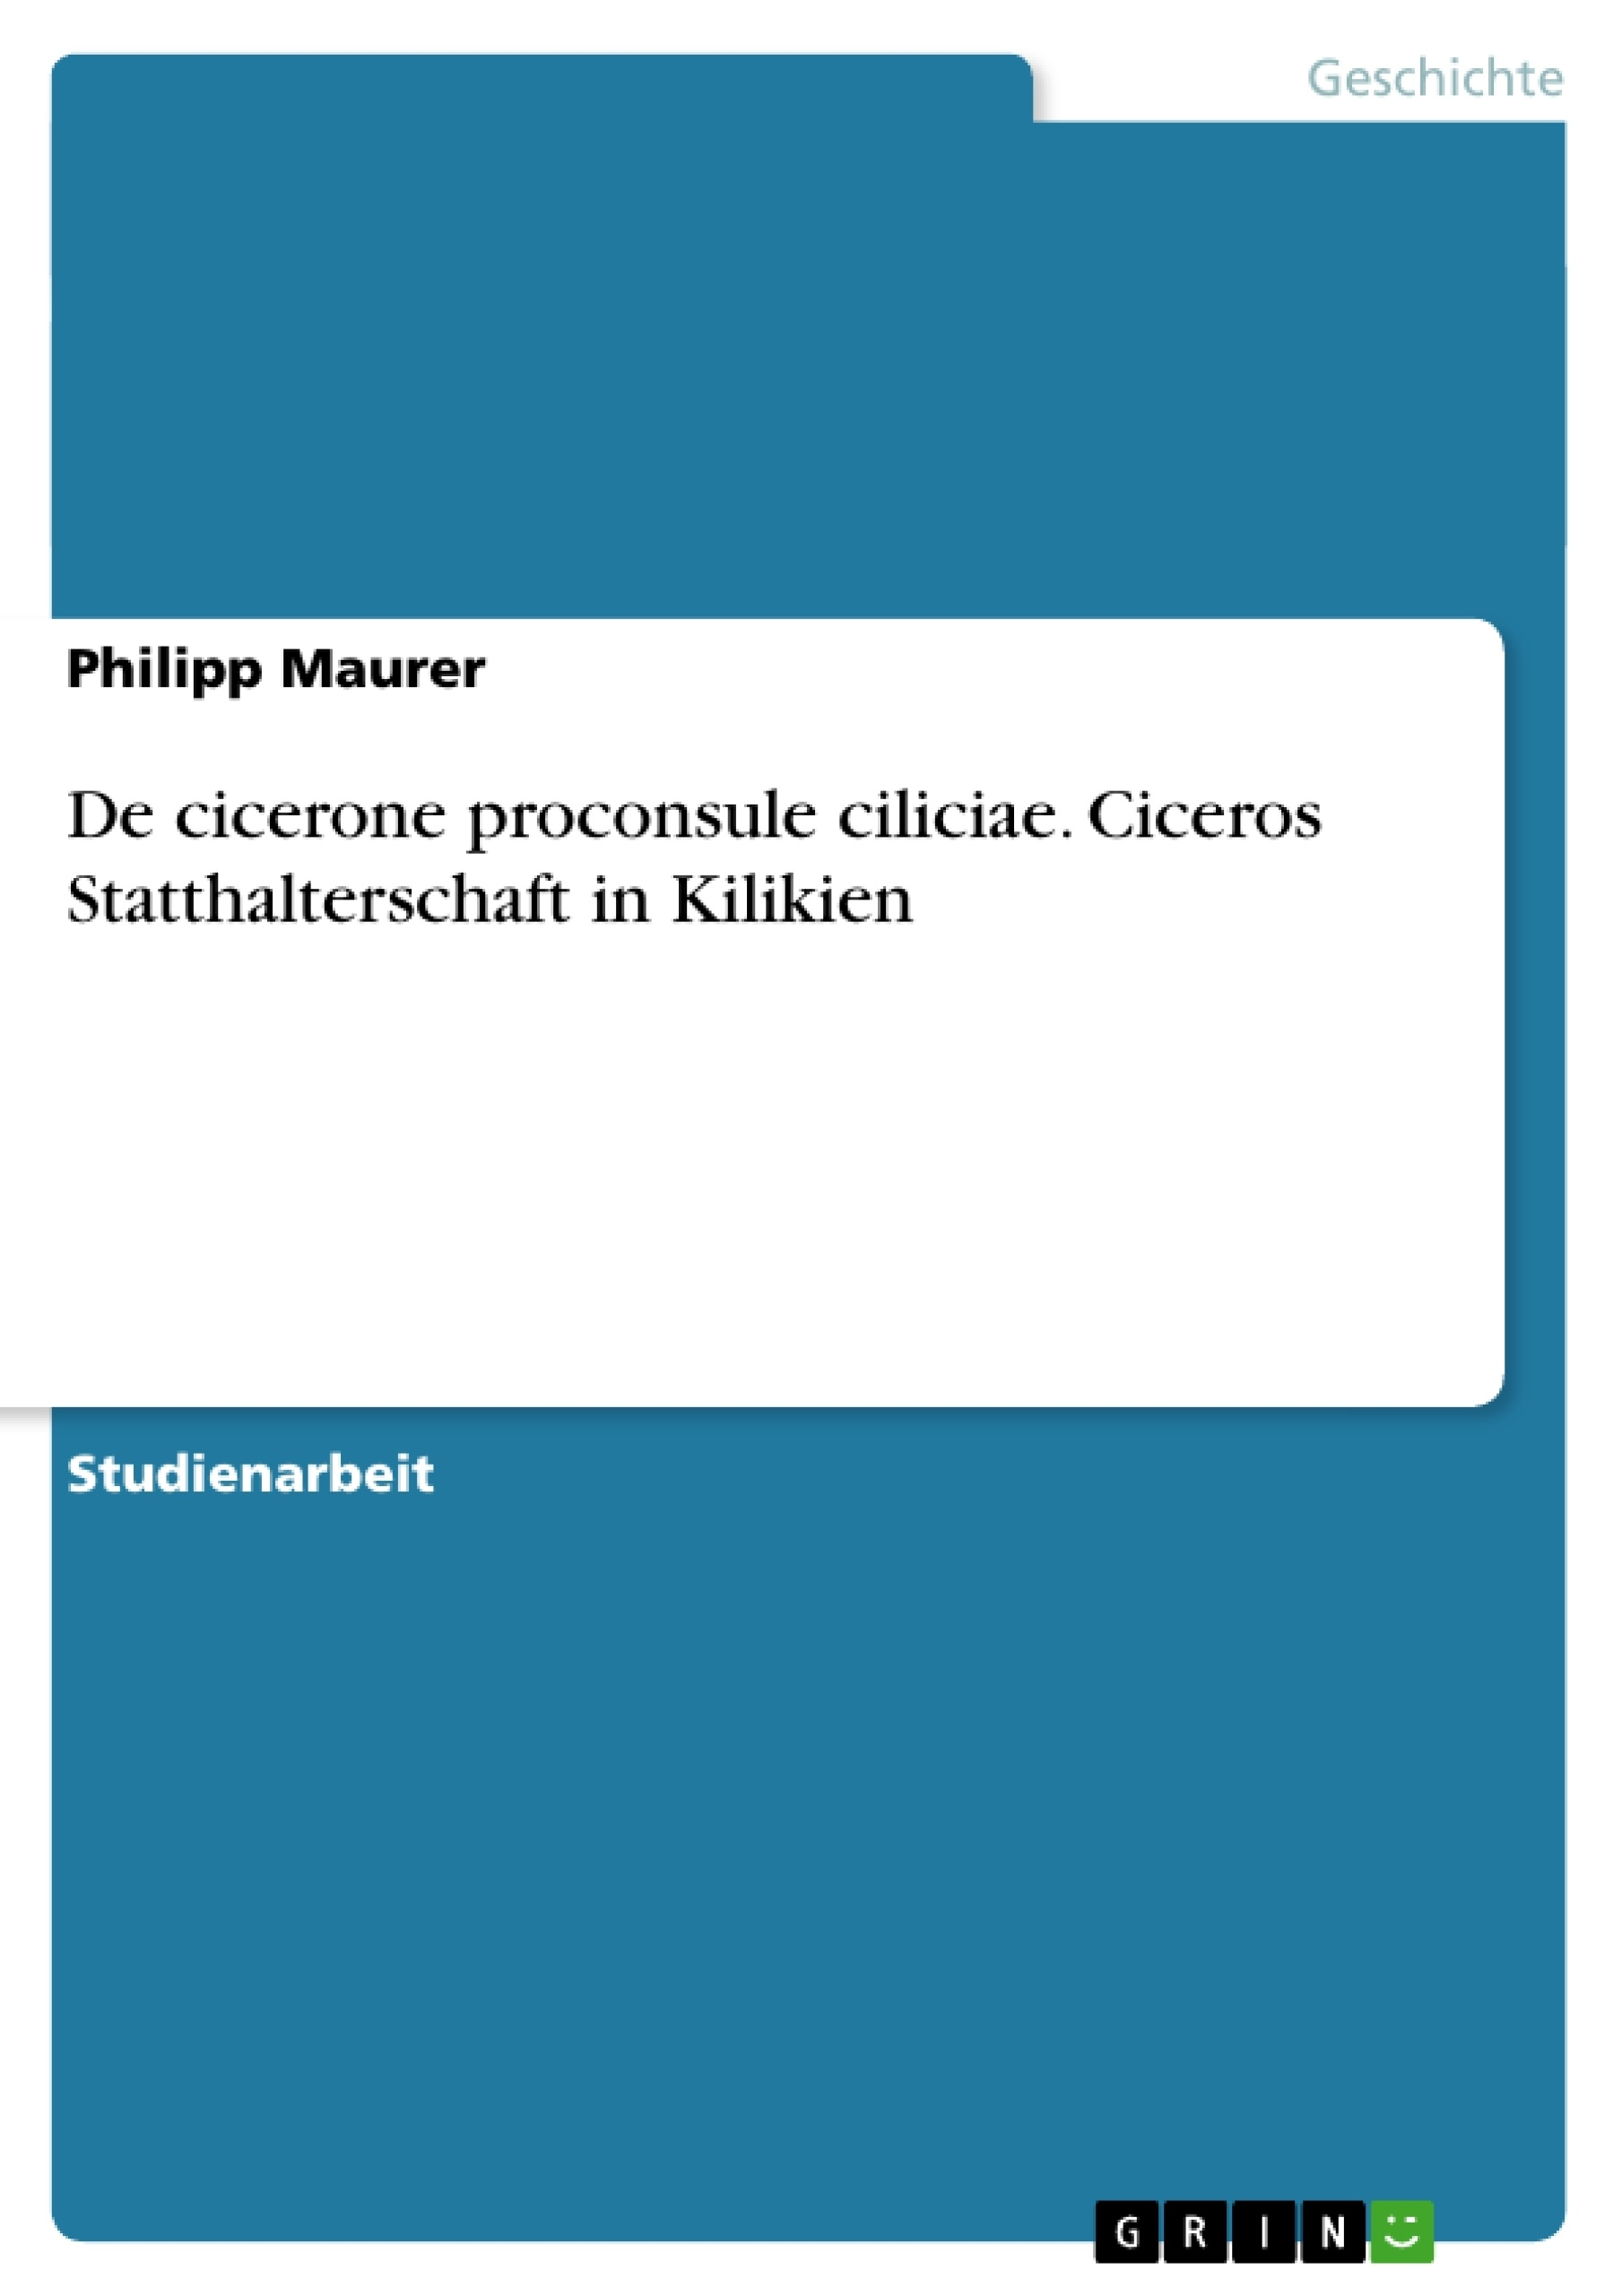 Titel: De cicerone proconsule ciliciae. Ciceros Statthalterschaft in Kilikien